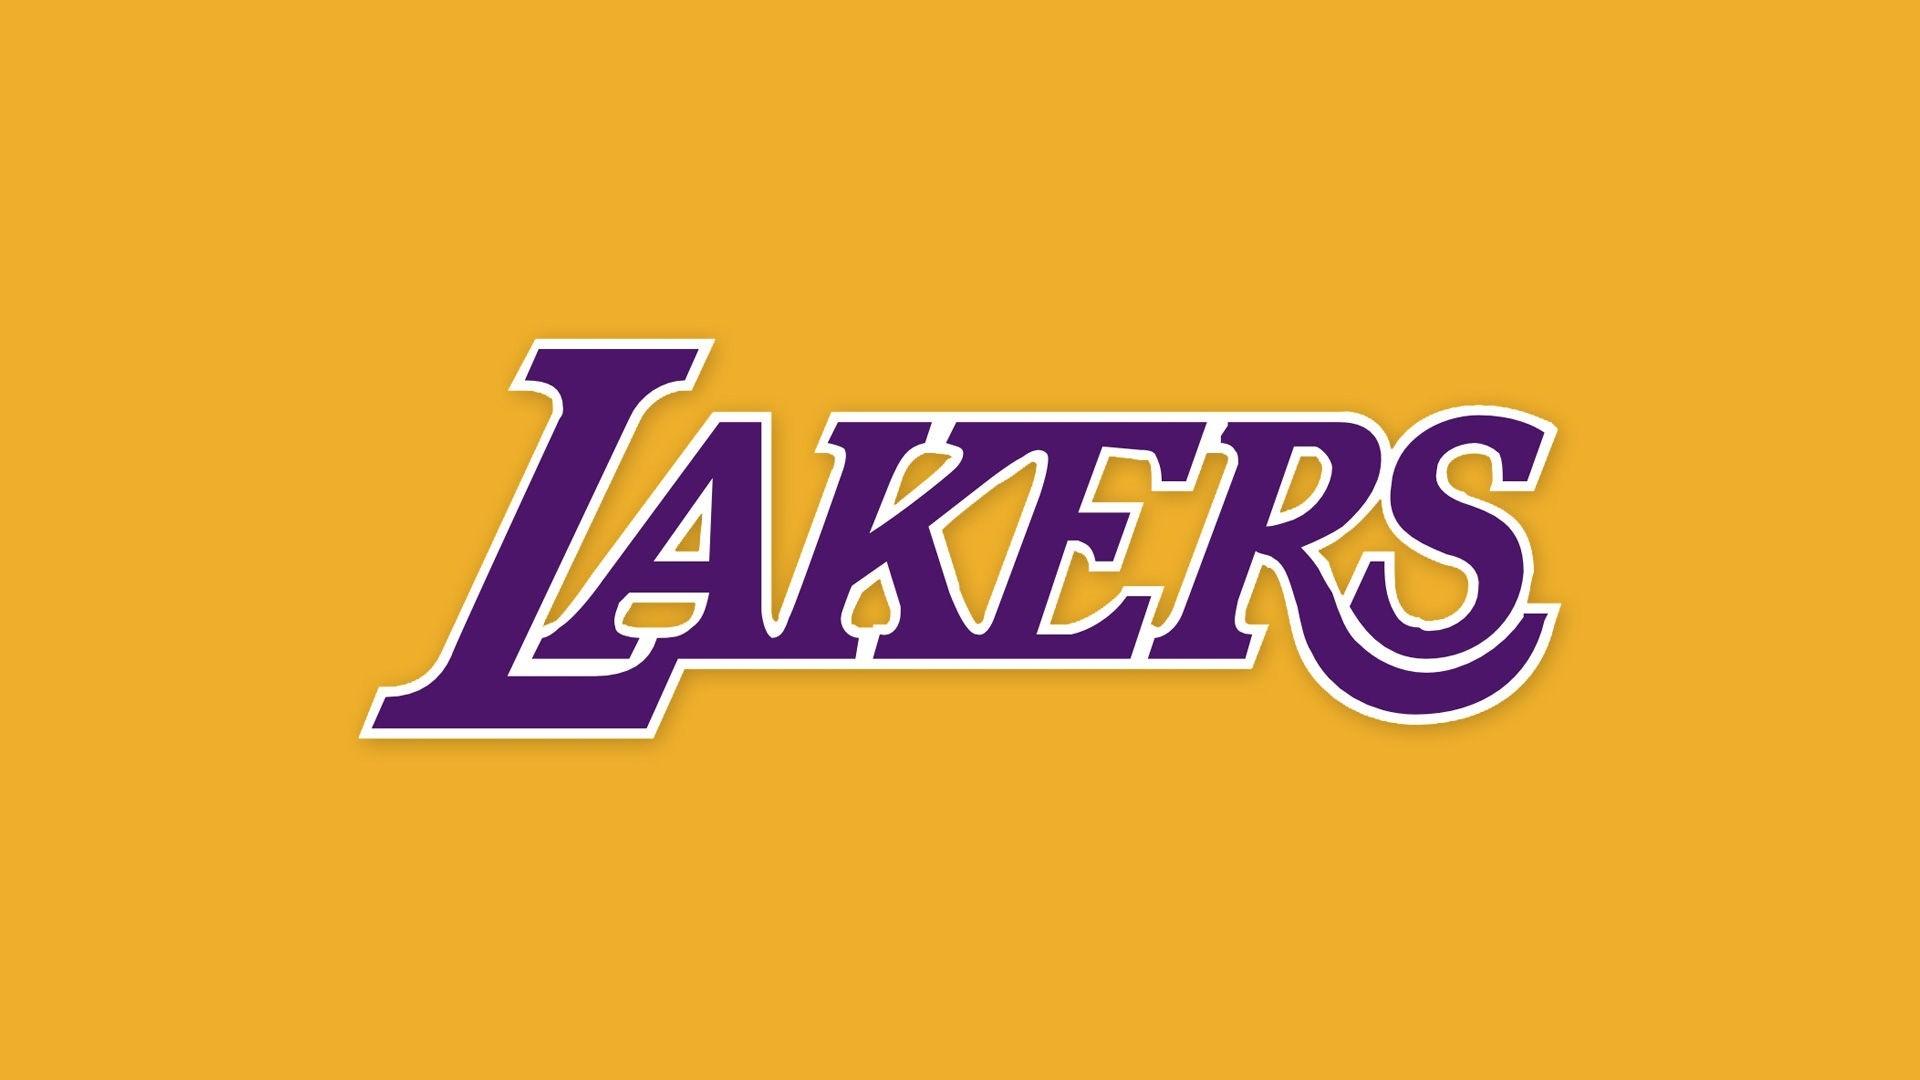 Los Angeles Lakers Wallpaper For Mac Backgrounds With Los Angeles Lakers 1920x1080 Wallpaper Teahub Io